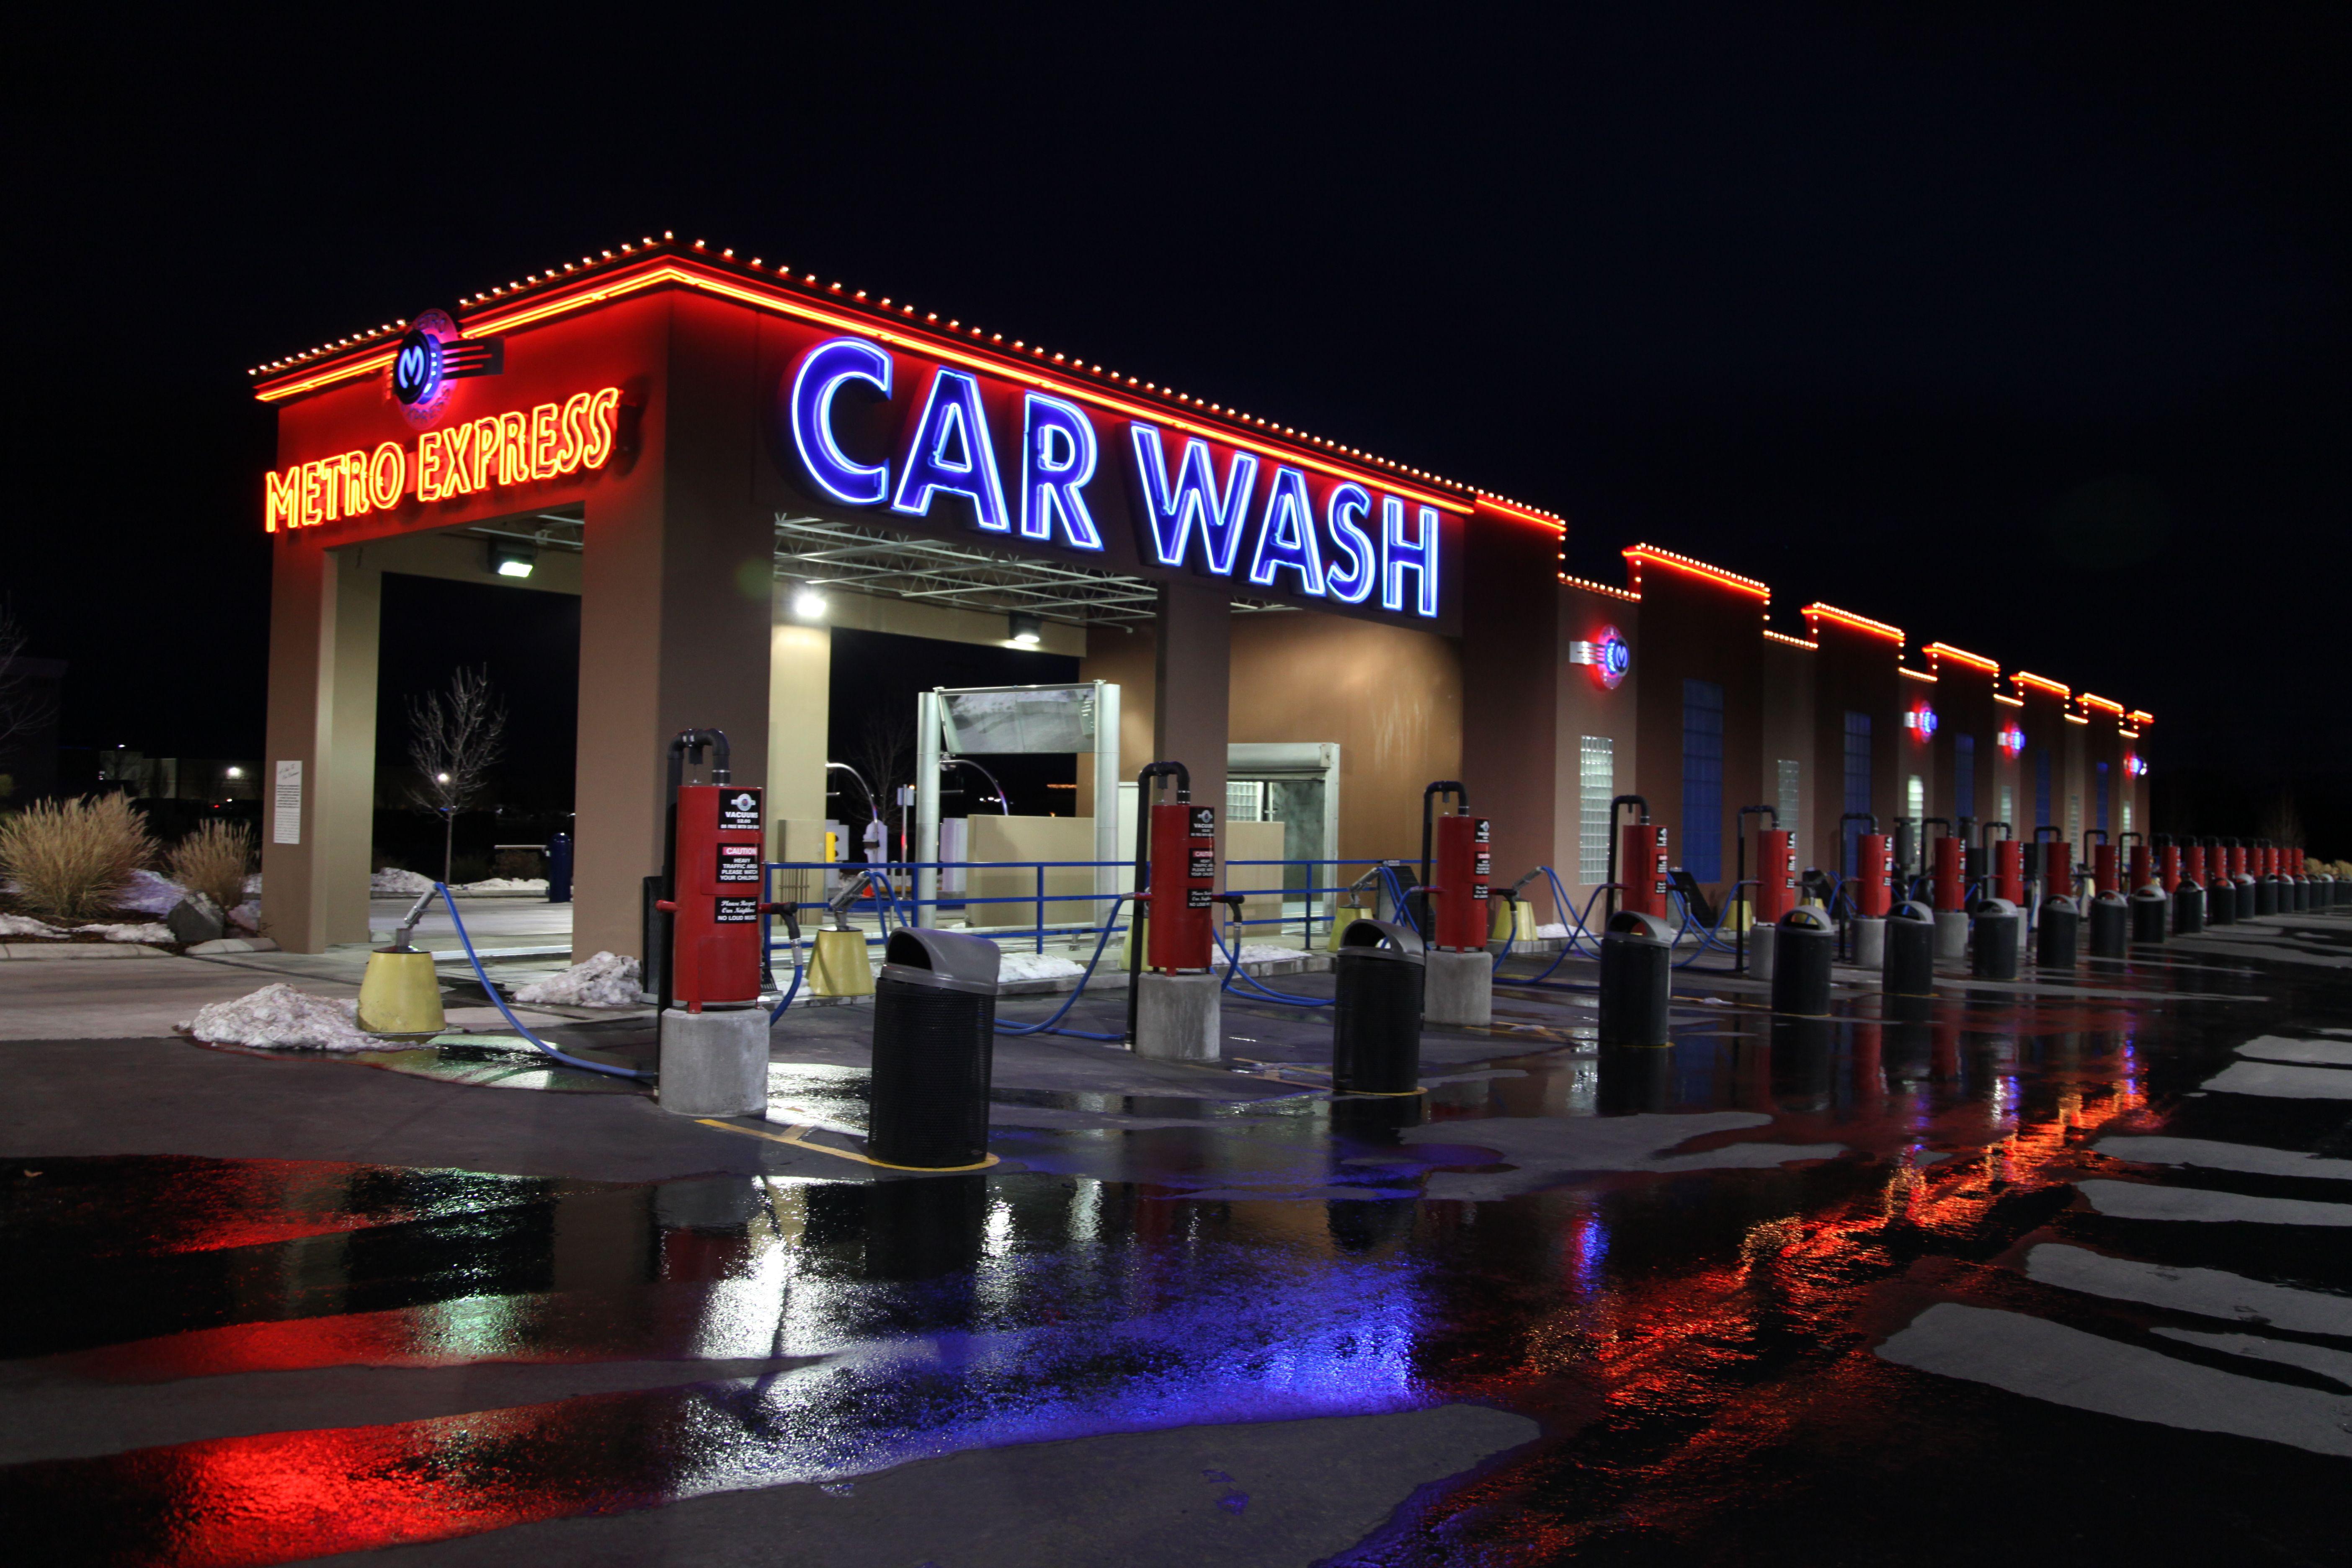 Meridian wash at night Car wash business, Car wash